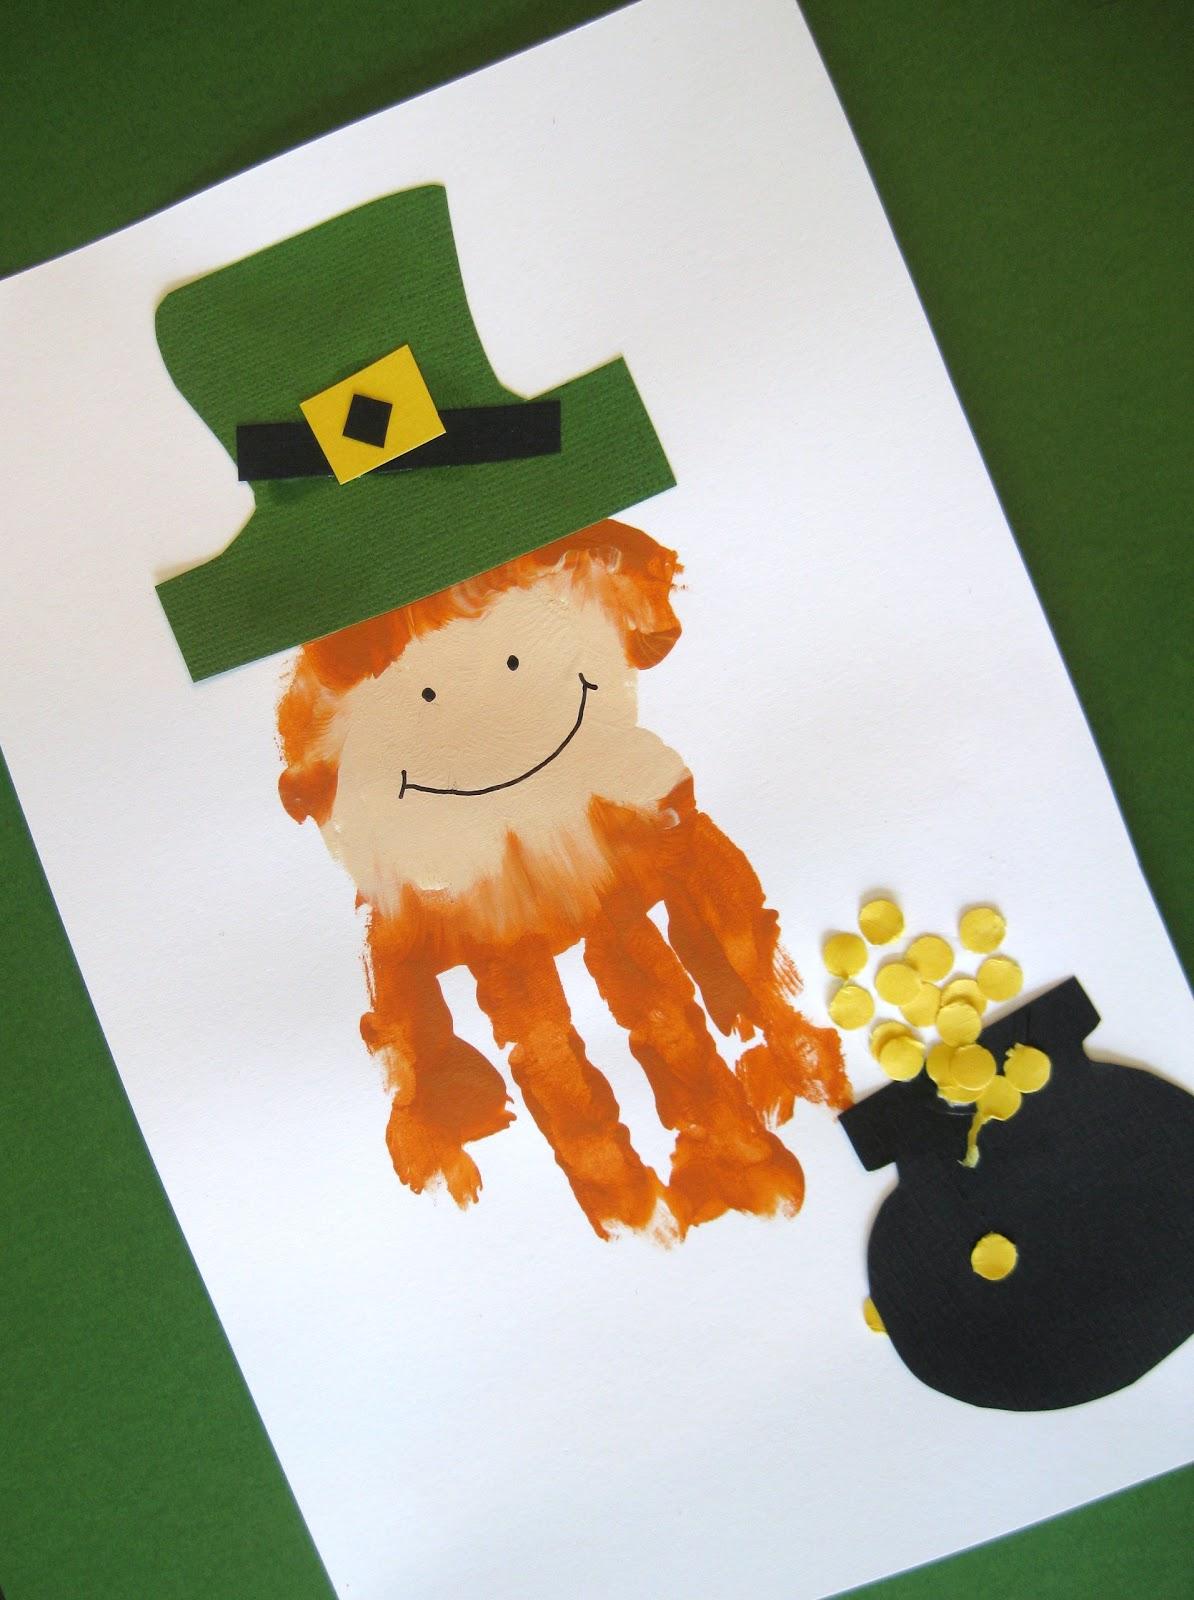 Preschool Crafts For Kids St Patrick S Day Hand Print Leprechaun Craft